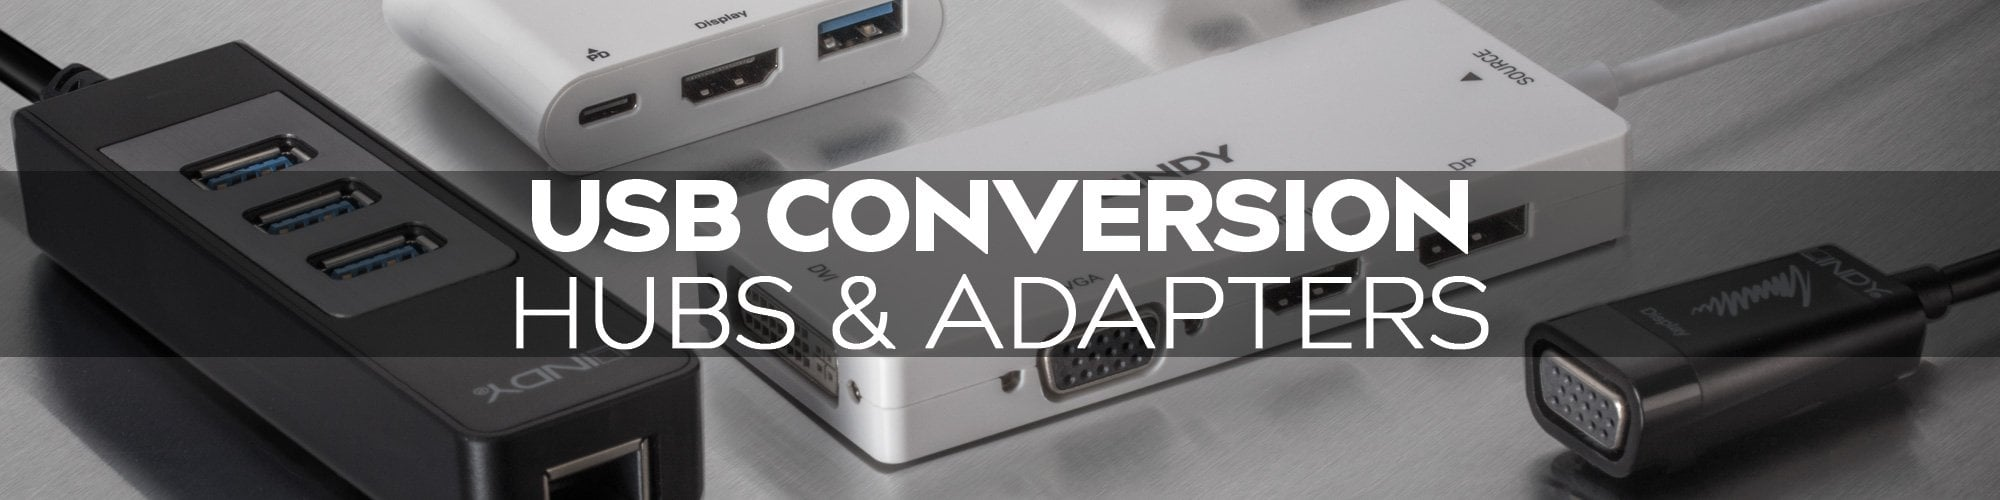 USB Conversion